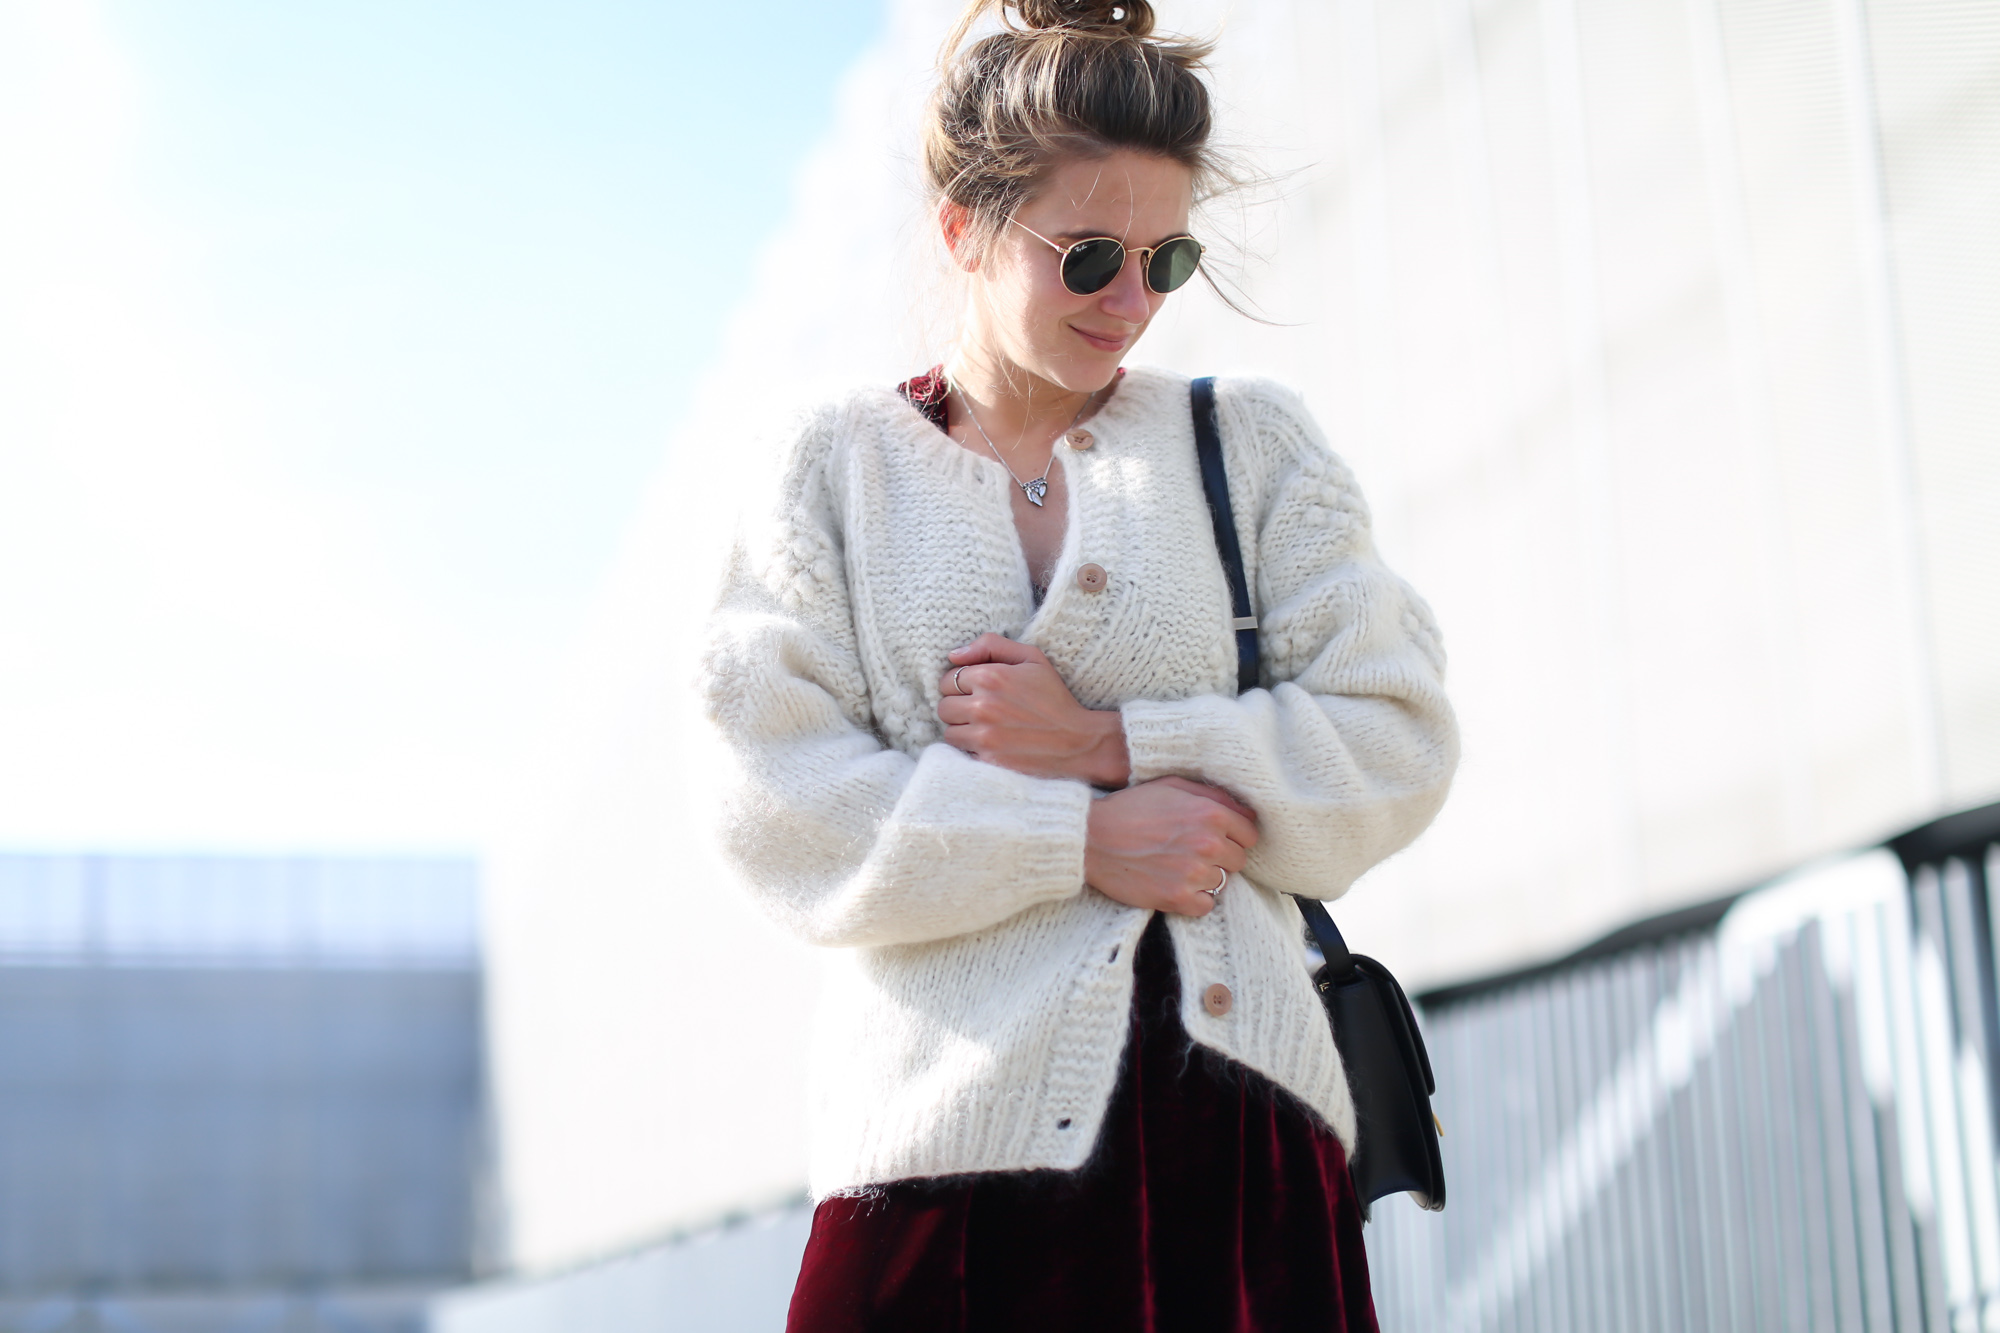 Clochet_streetstyle_fashionblogger_intropia_jerseylanaochosabiertogordito_vestidoterciopelomasscob_adidassambablancas-6